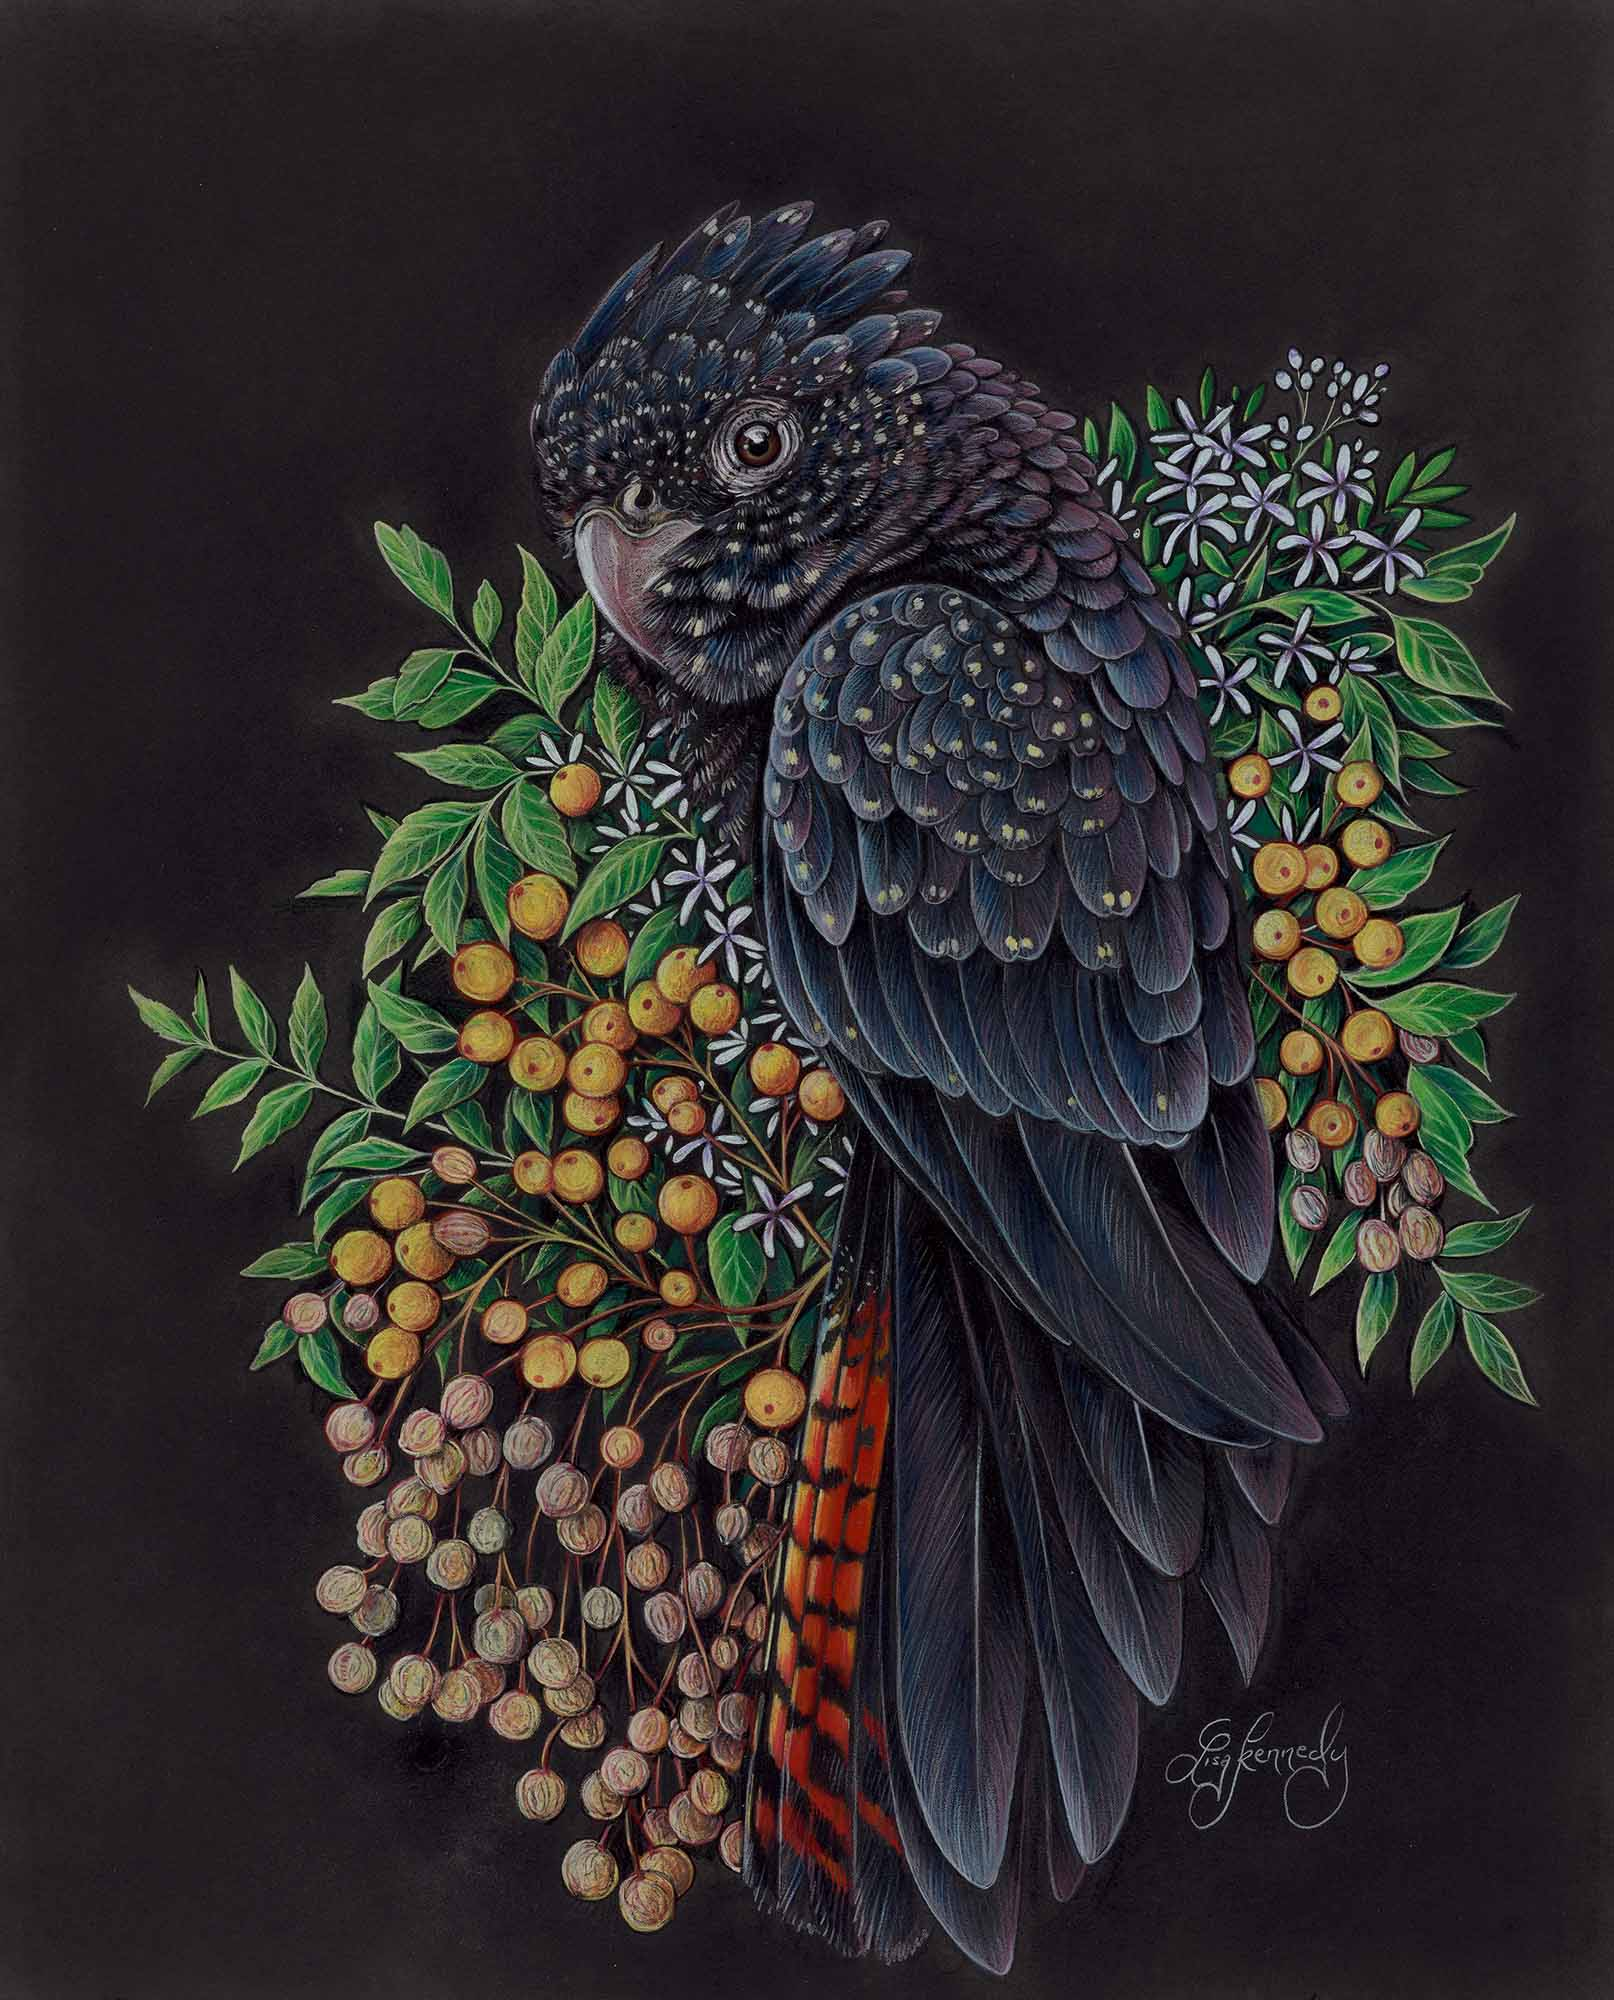 Lisa kennedy 011 red tailed black cockatoo 2000px ivdjbm